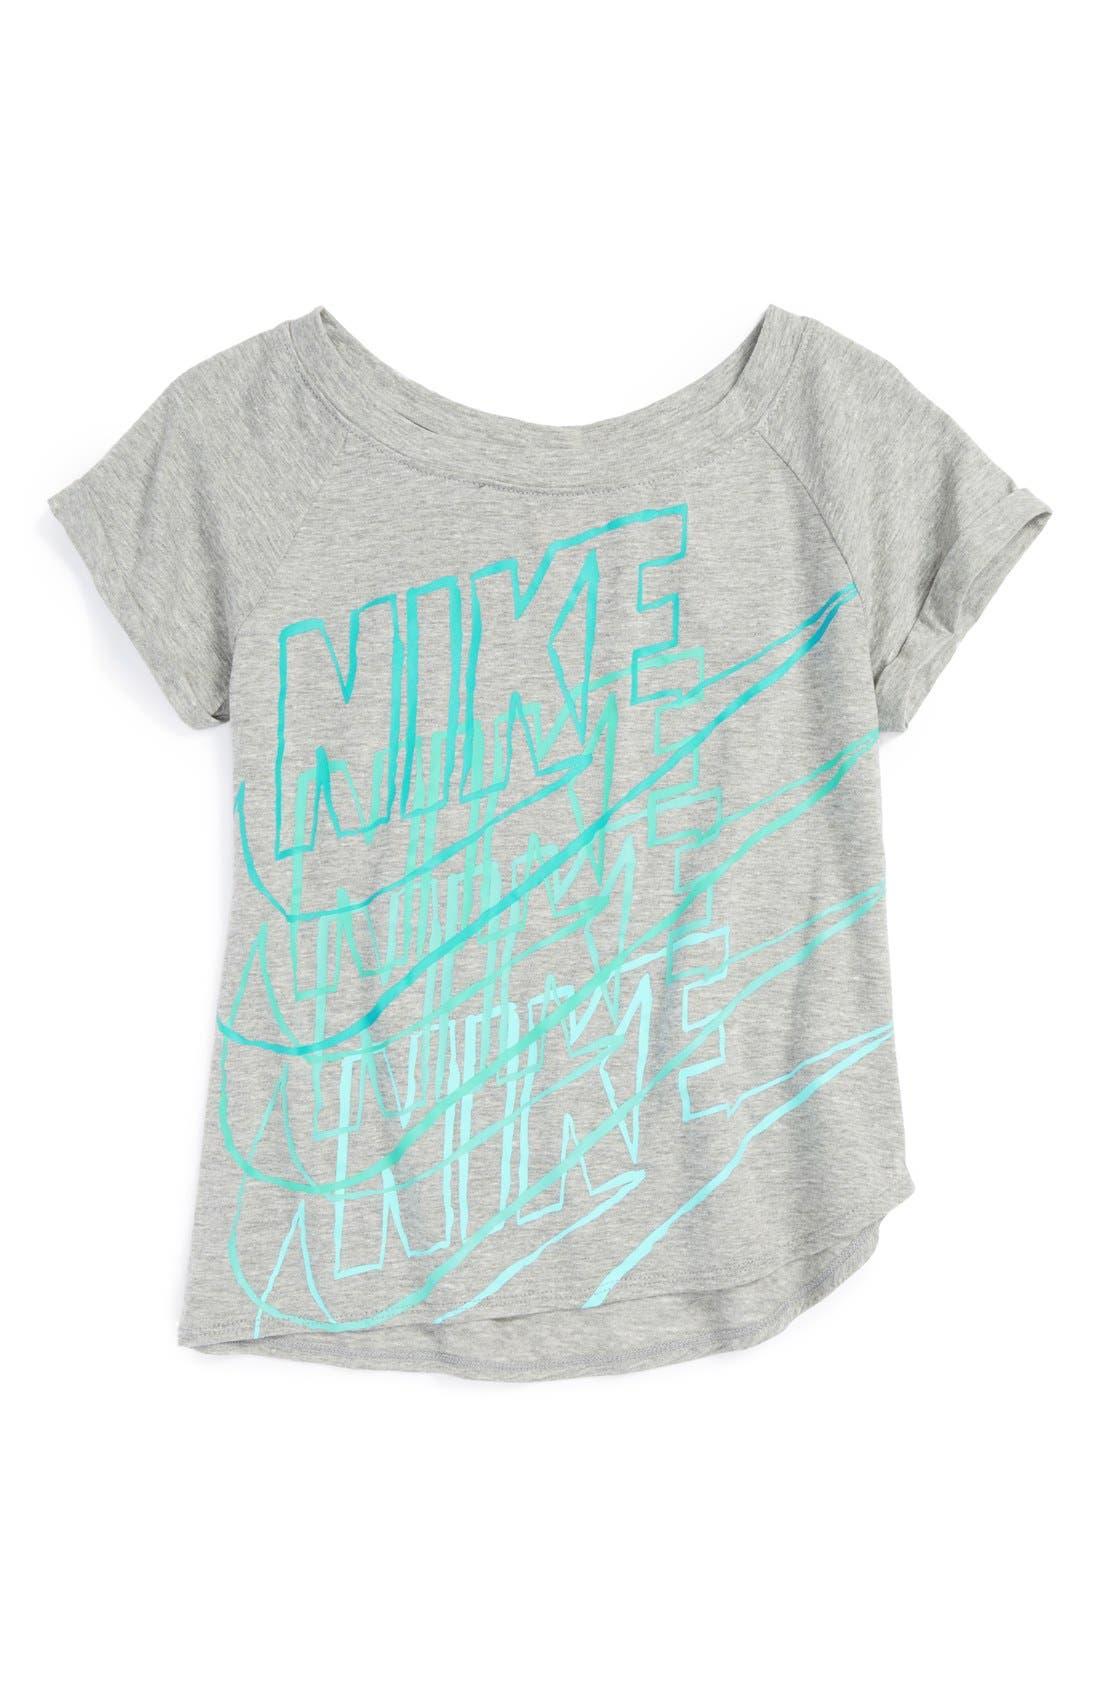 Alternate Image 1 Selected - Nike Graphic Tee (Little Girls & Big Girls)